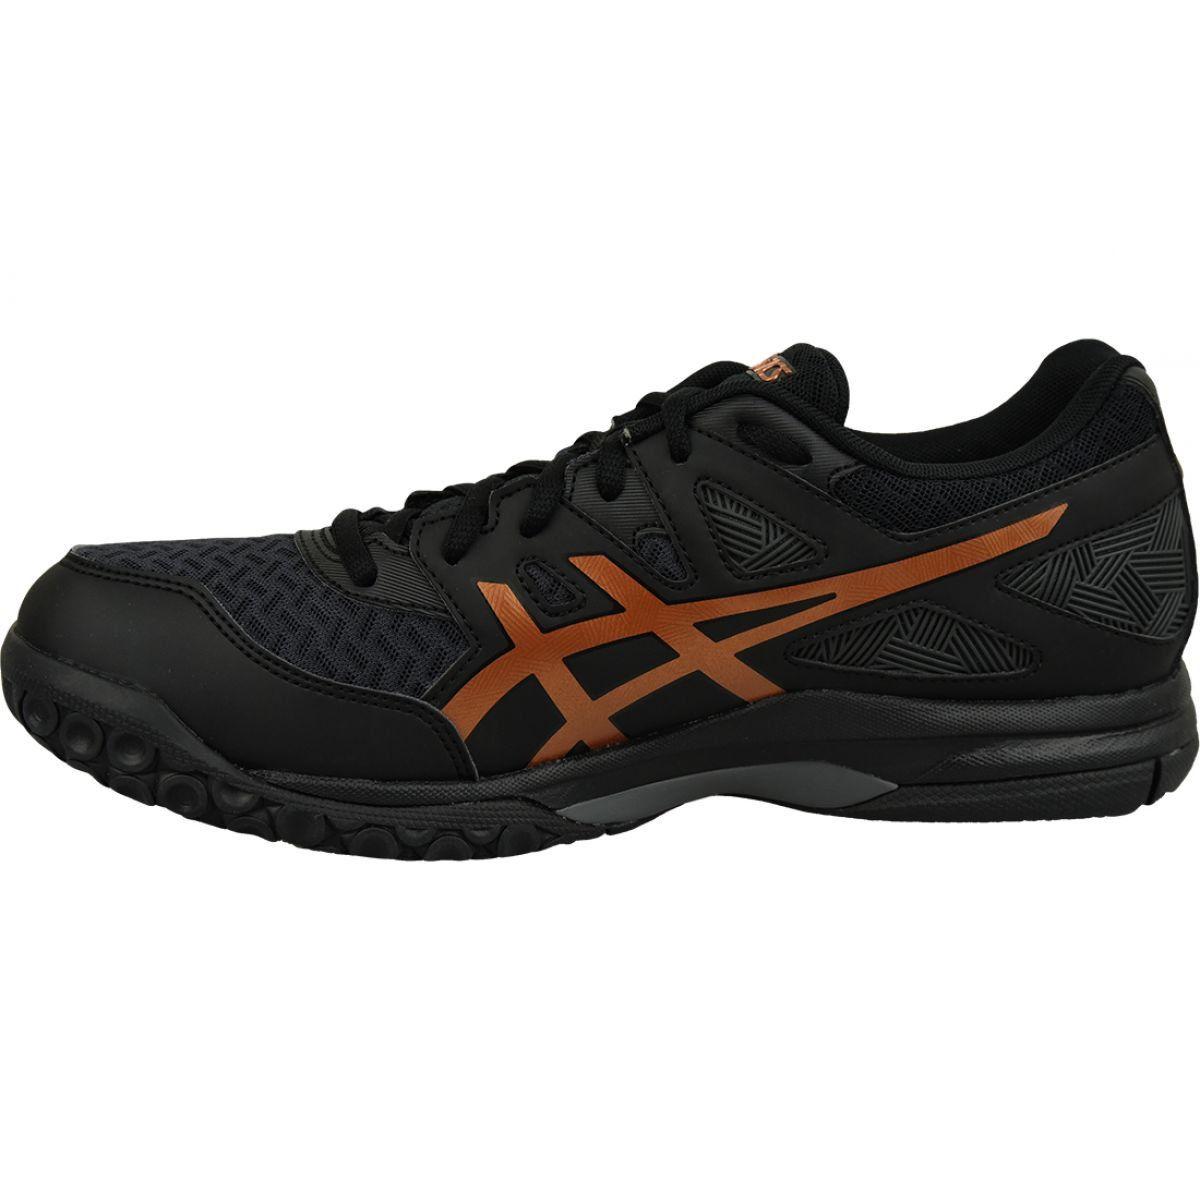 Asics Gel Task 2 M 1071a037 002 Shoes Black Black Asics Asics Gel Shoes